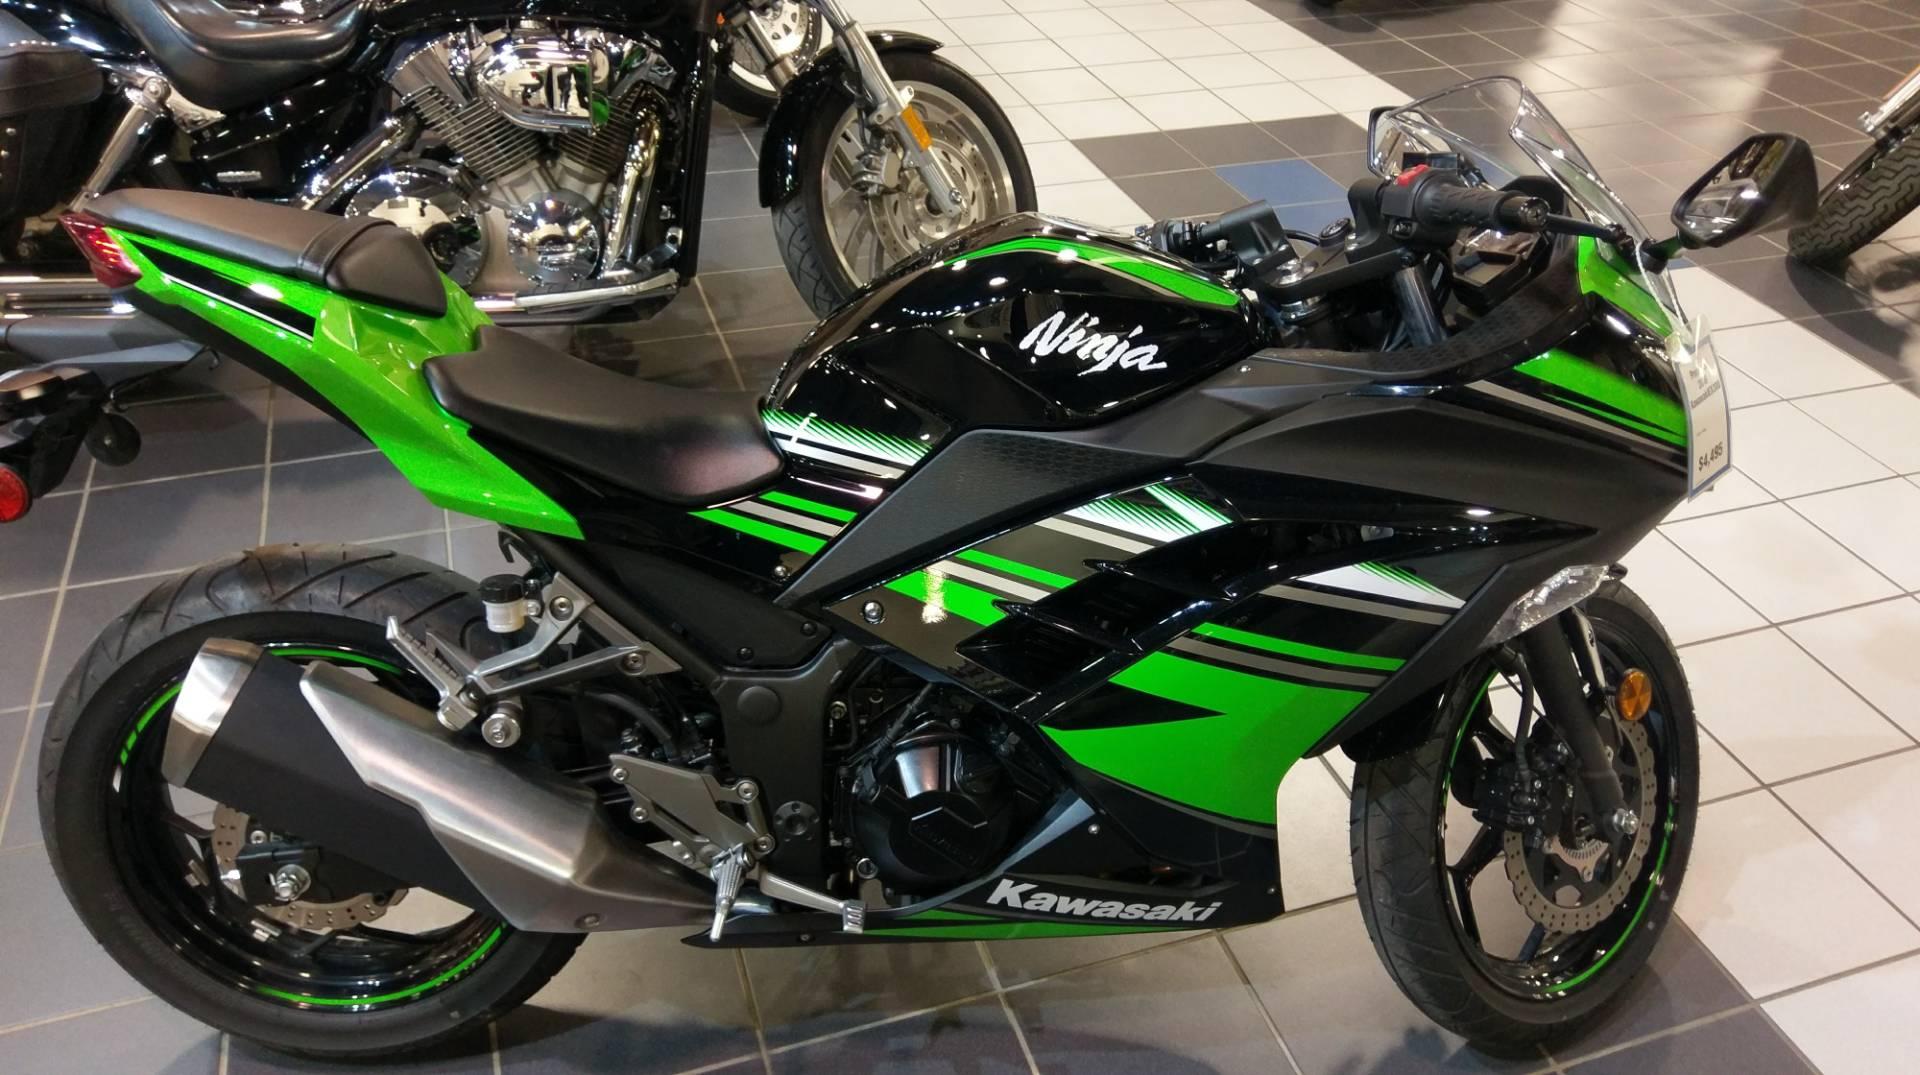 2016 Ninja 300 ABS KRT Edition